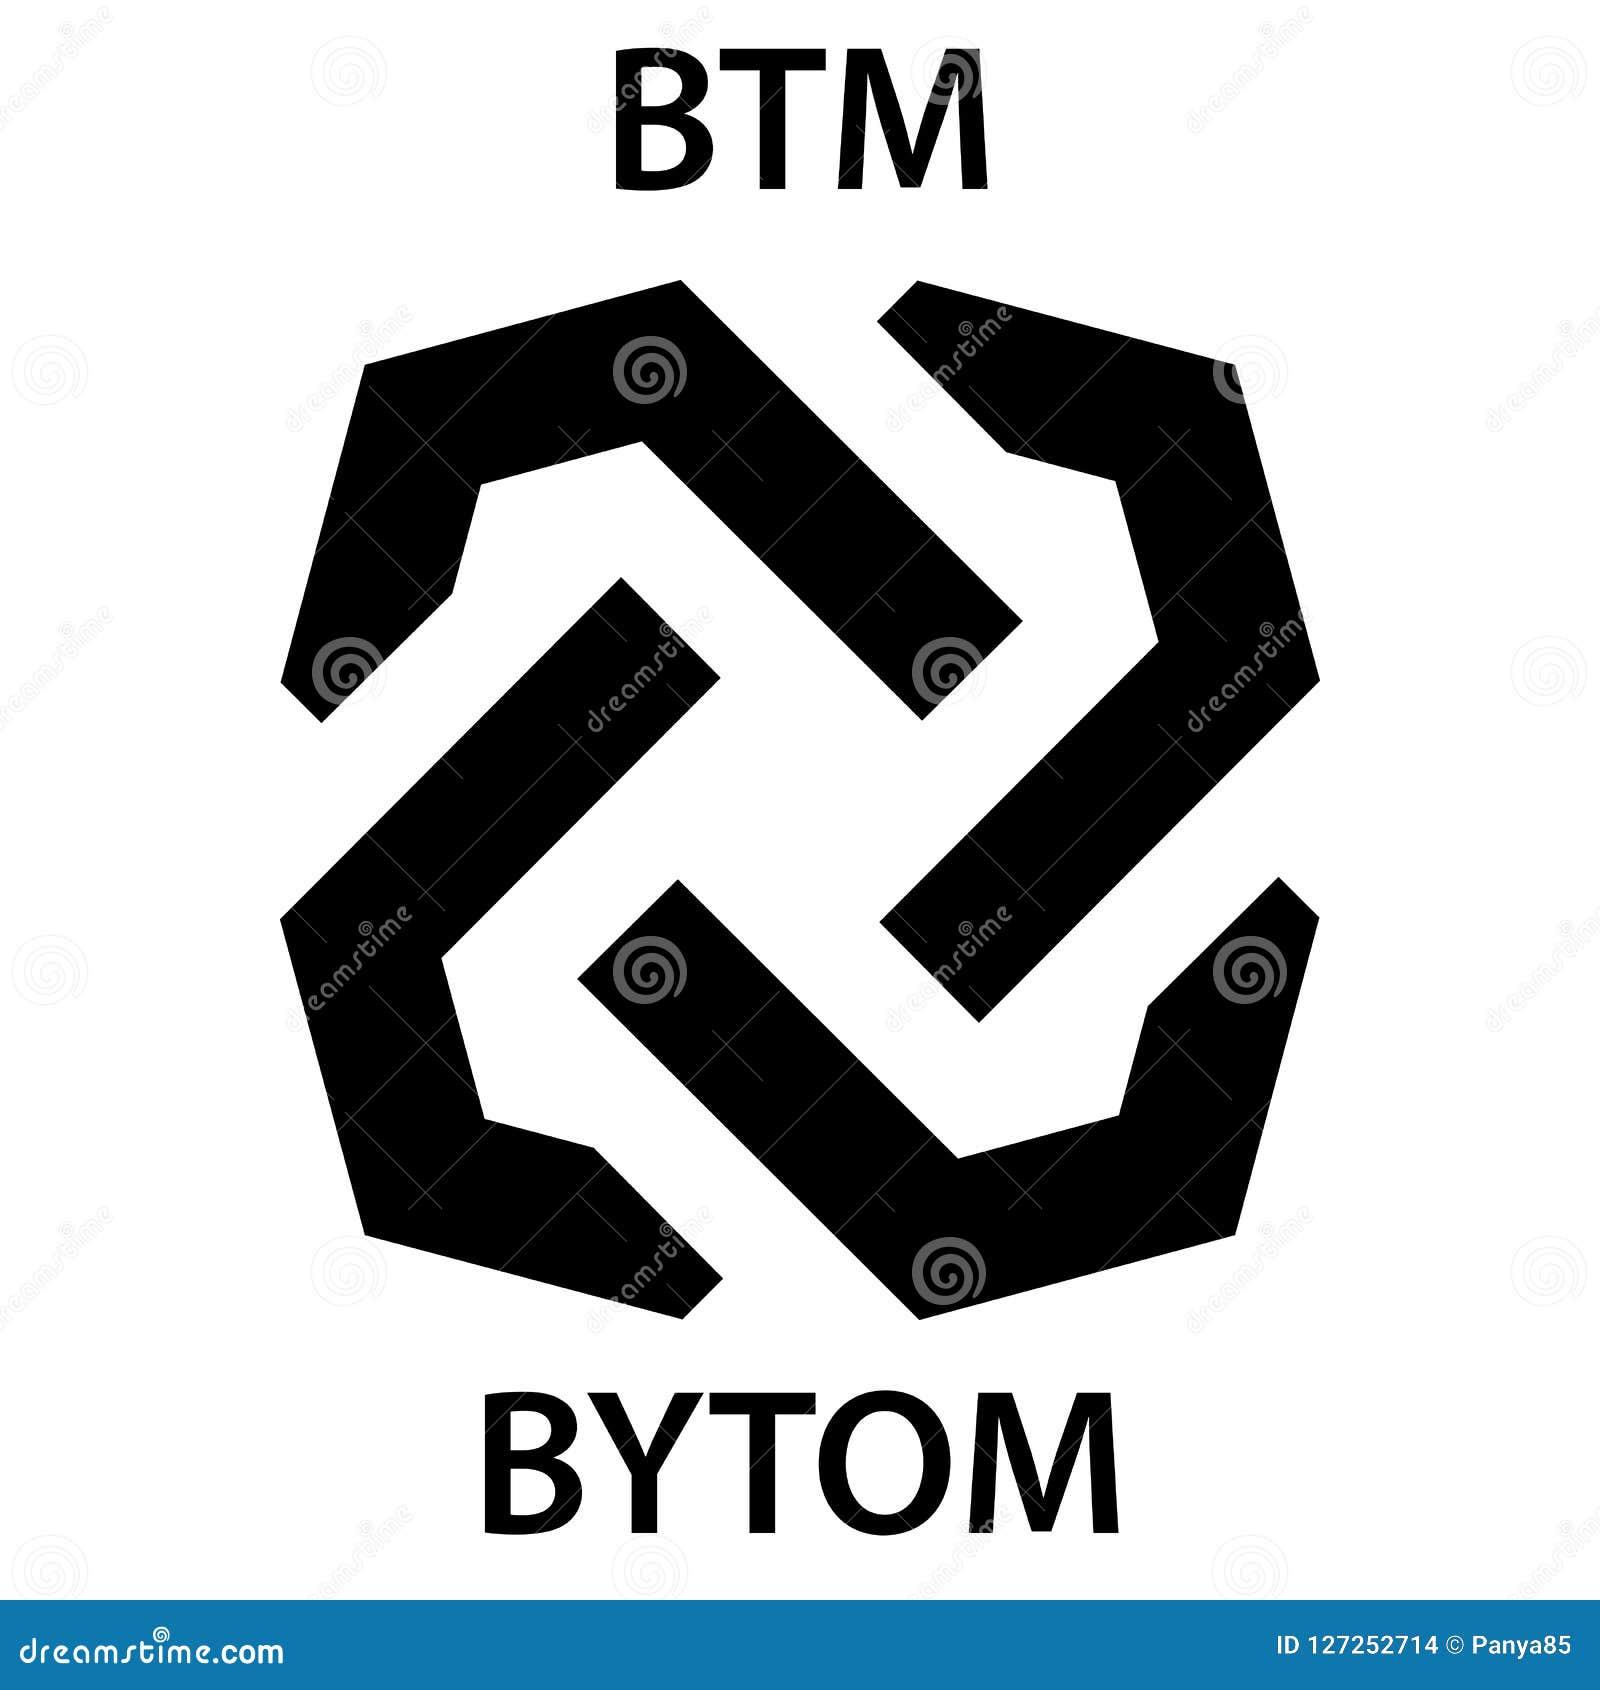 buy bytom cryptocurrency